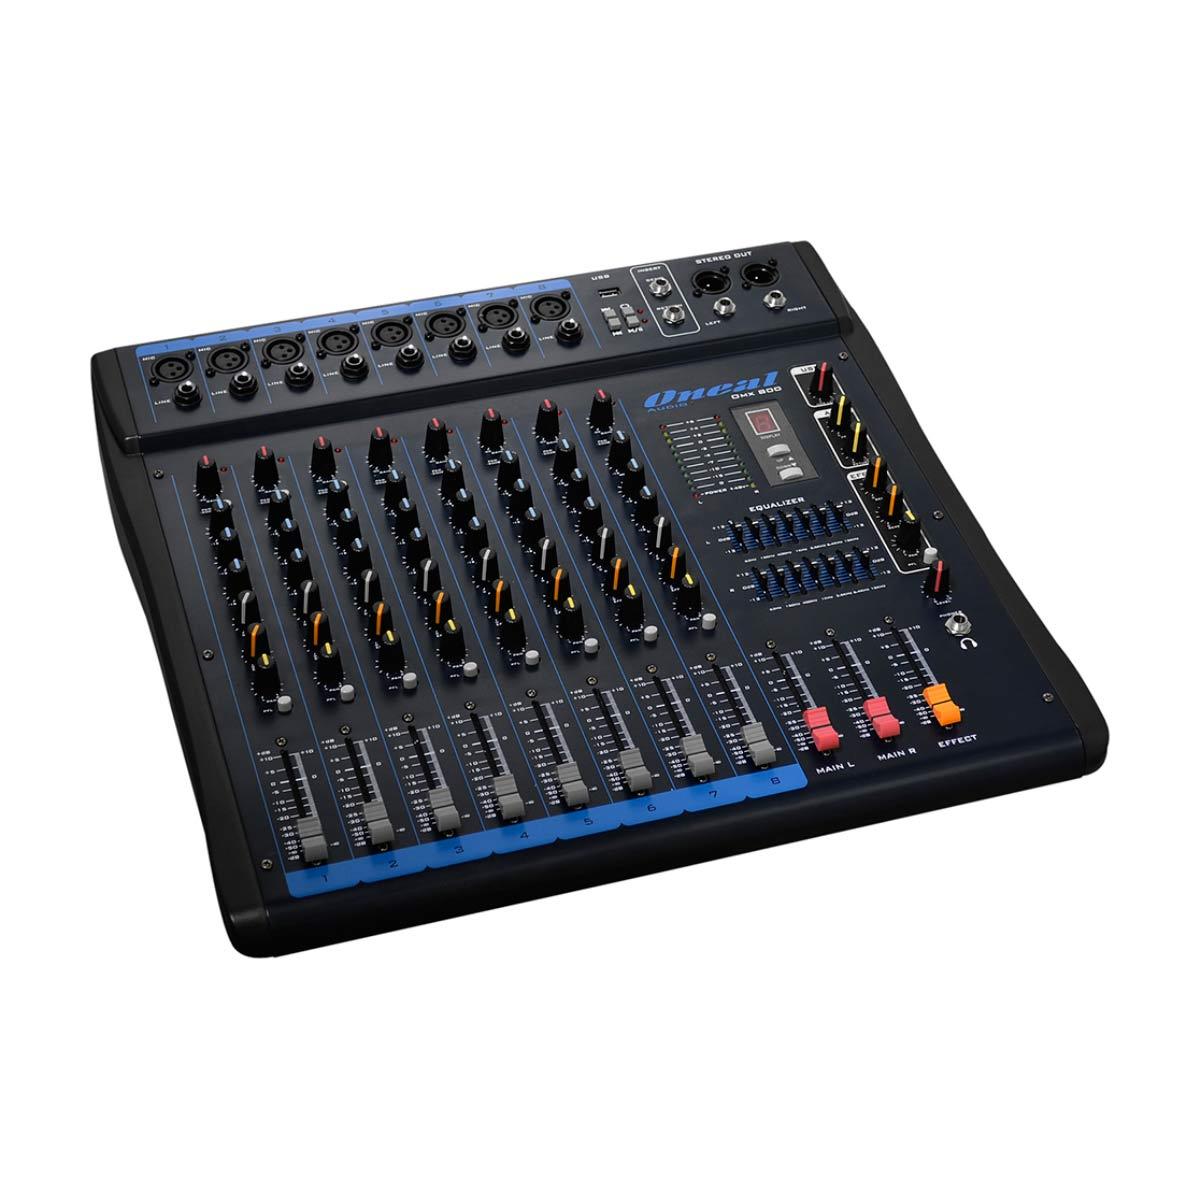 OMX800 - Mesa de Som / Mixer 8 Canais USB OMX 800 - Oneal